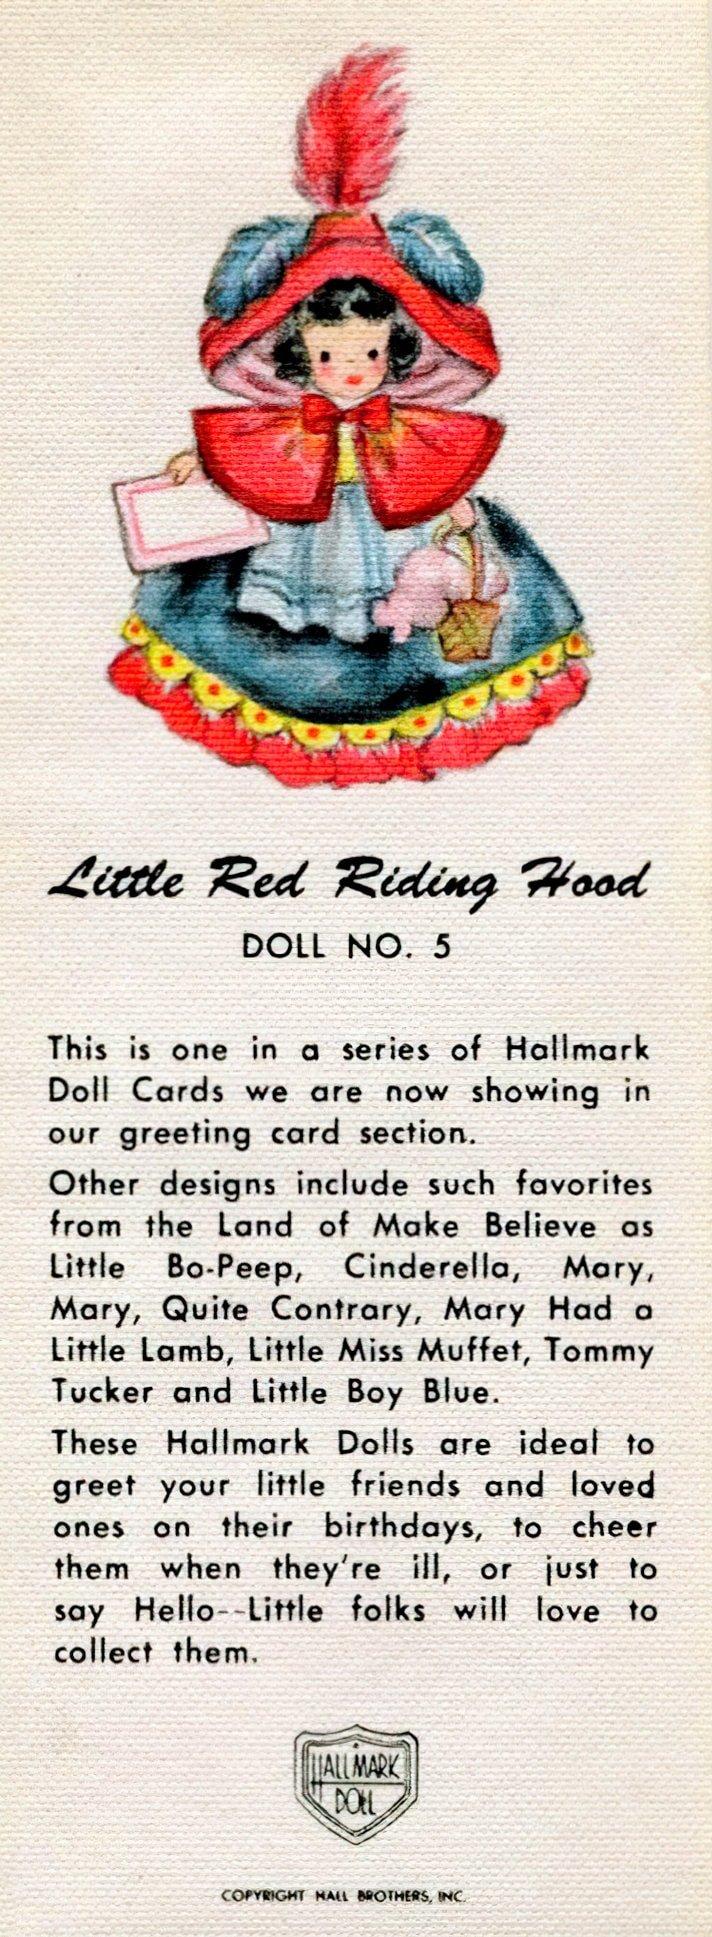 Vintage 1940s Hallmark Doll cards - Red Riding Hood